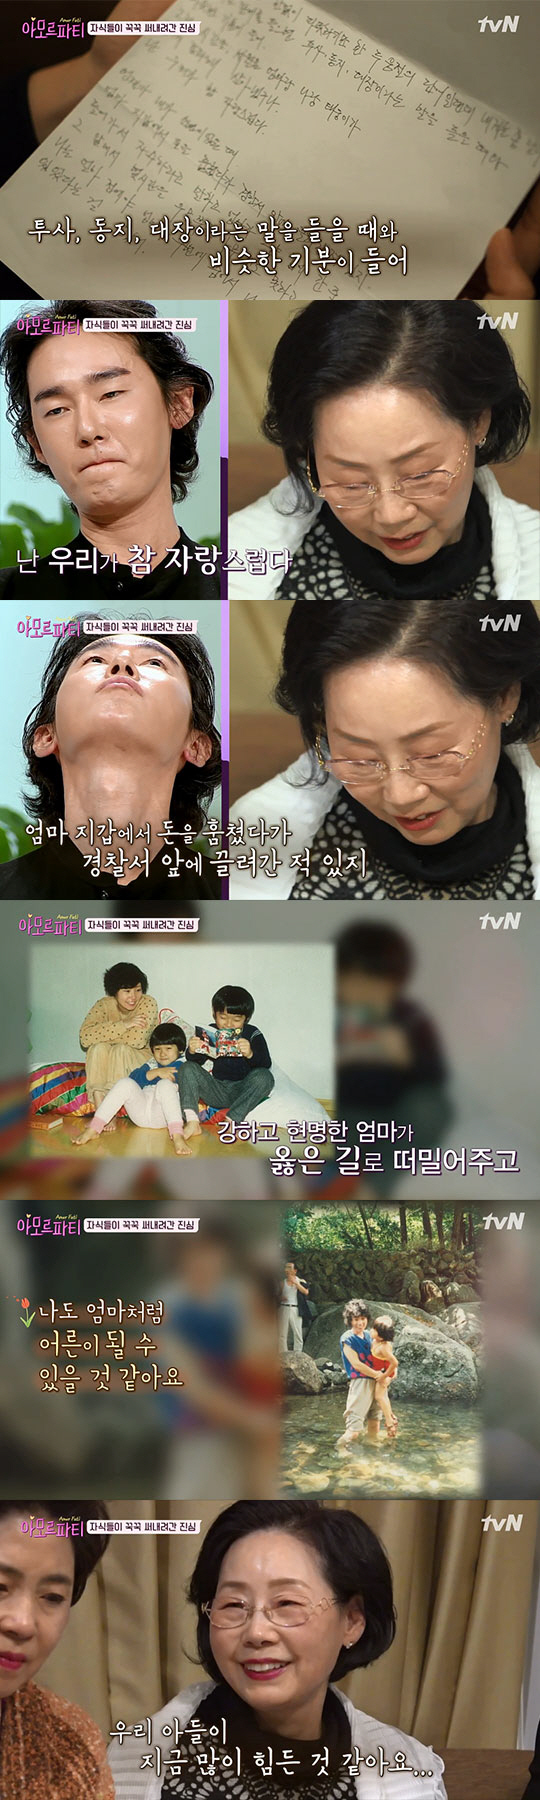 "[SC리뷰]'아모르파티' 허지웅 ""대장·동지 같은 엄마, 자랑스럽다"" ♥고백"